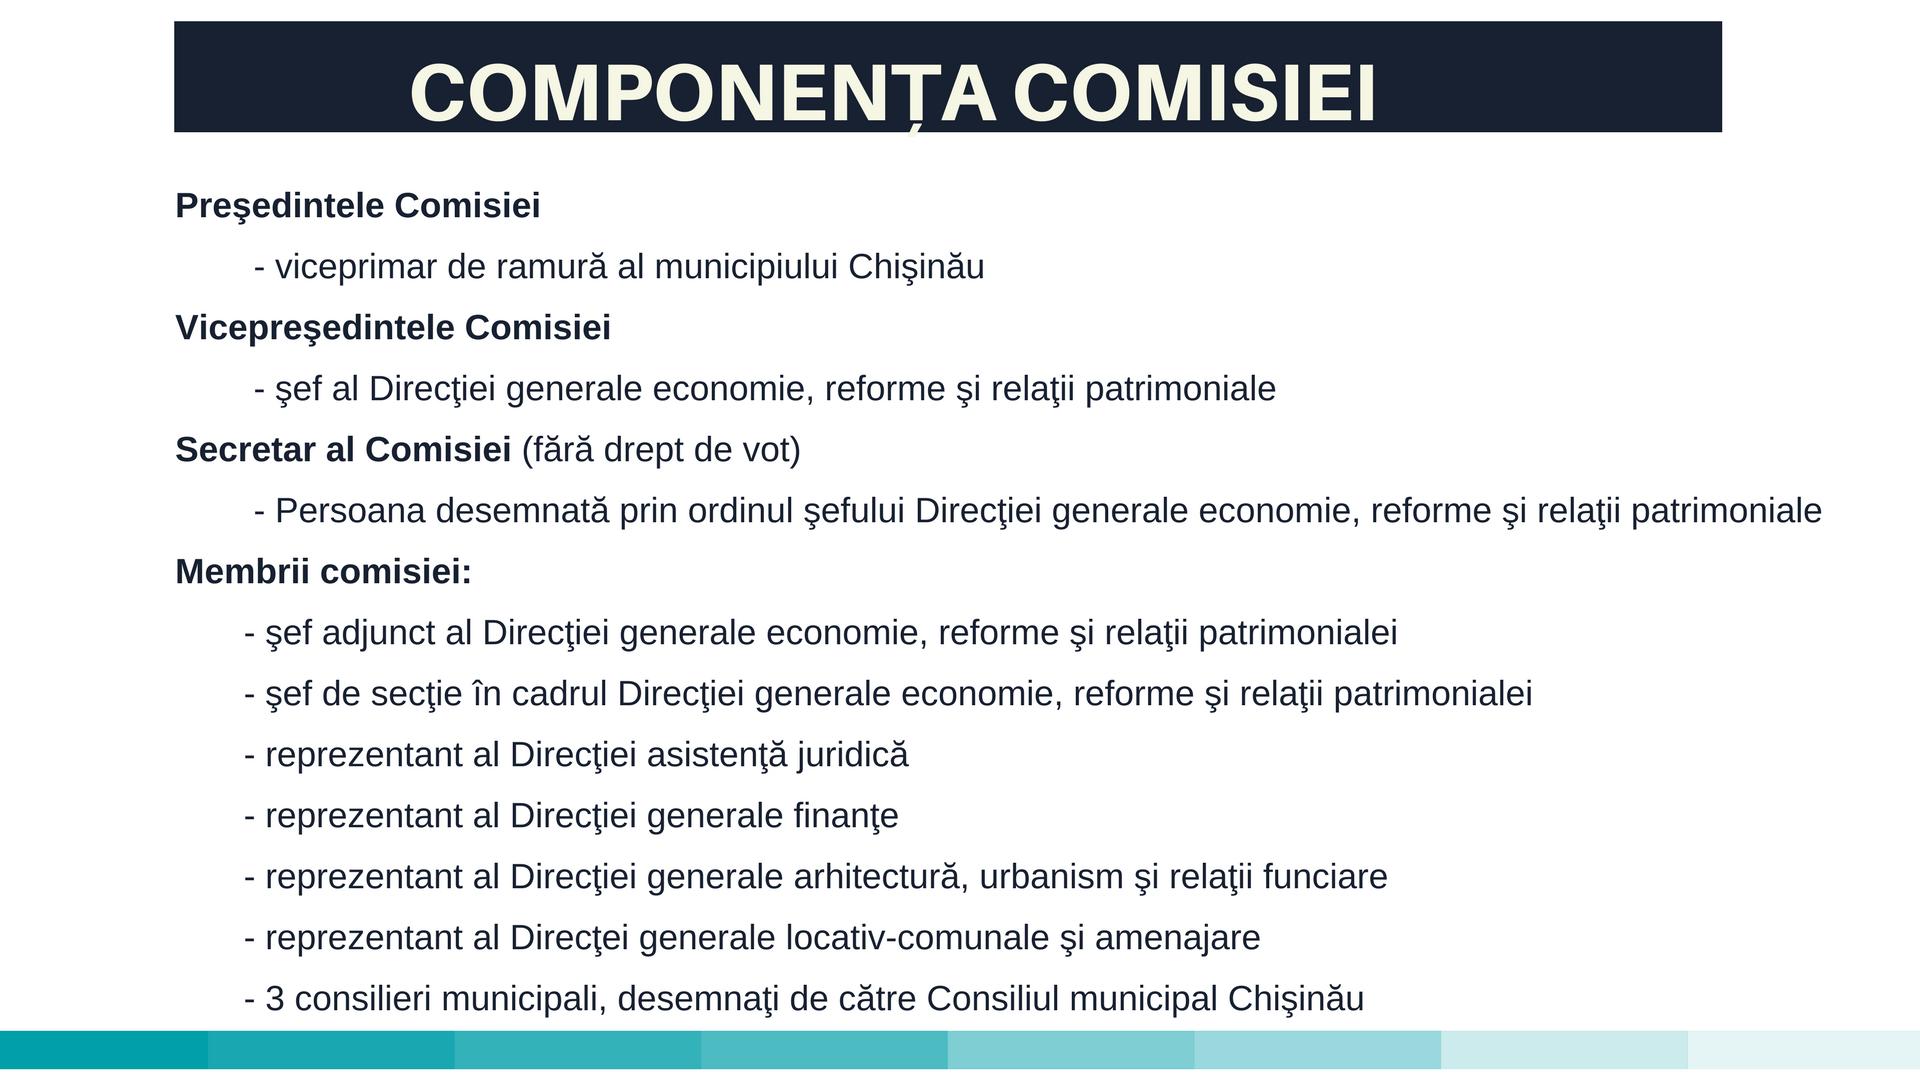 componenta comisiei